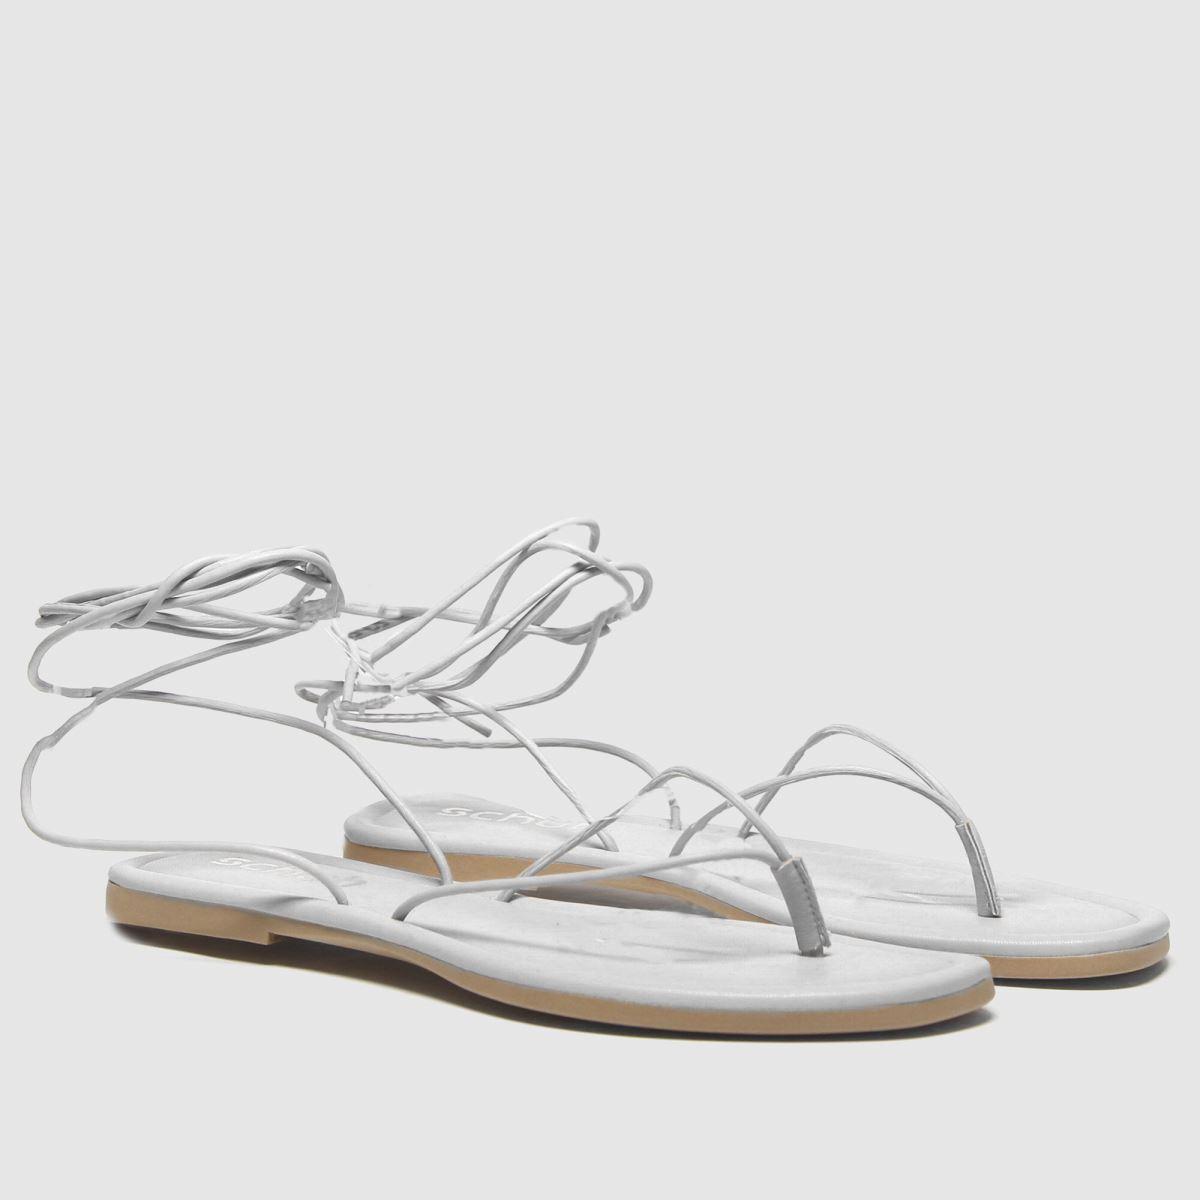 Womens White schuh Lisbon Tie Up Sandal